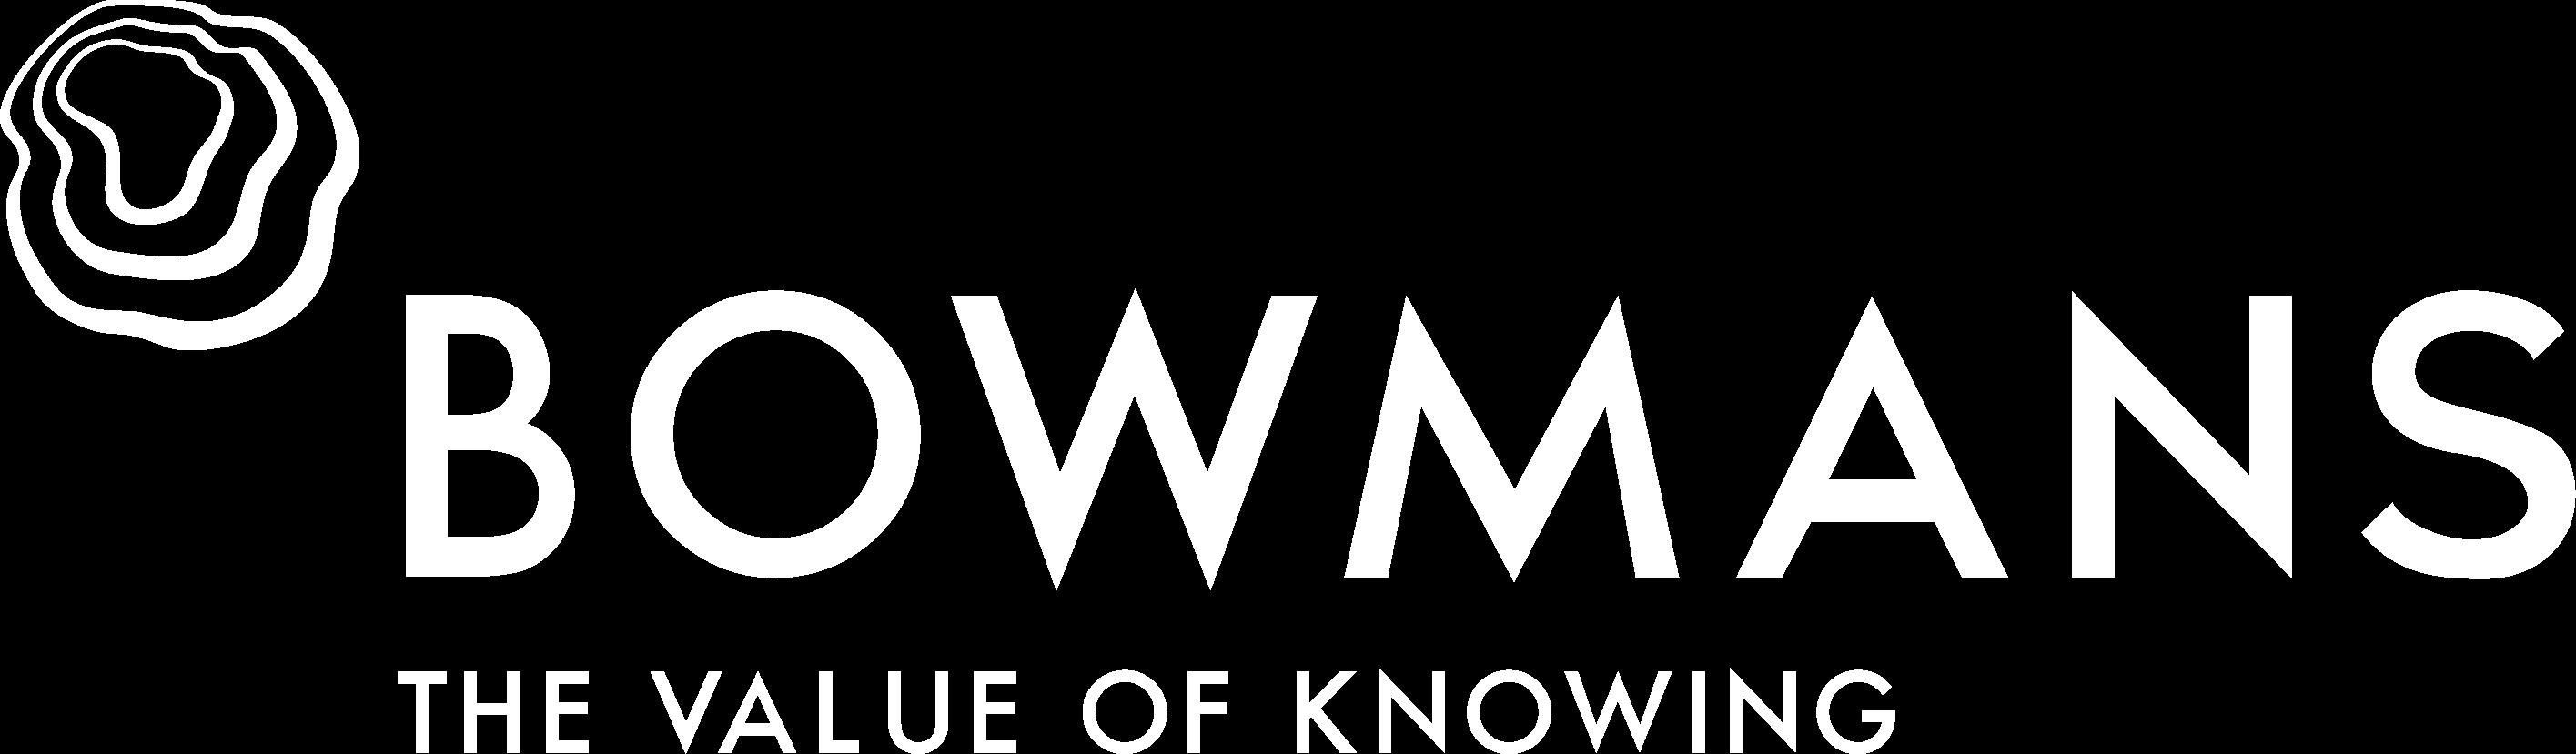 16 logo bowmans